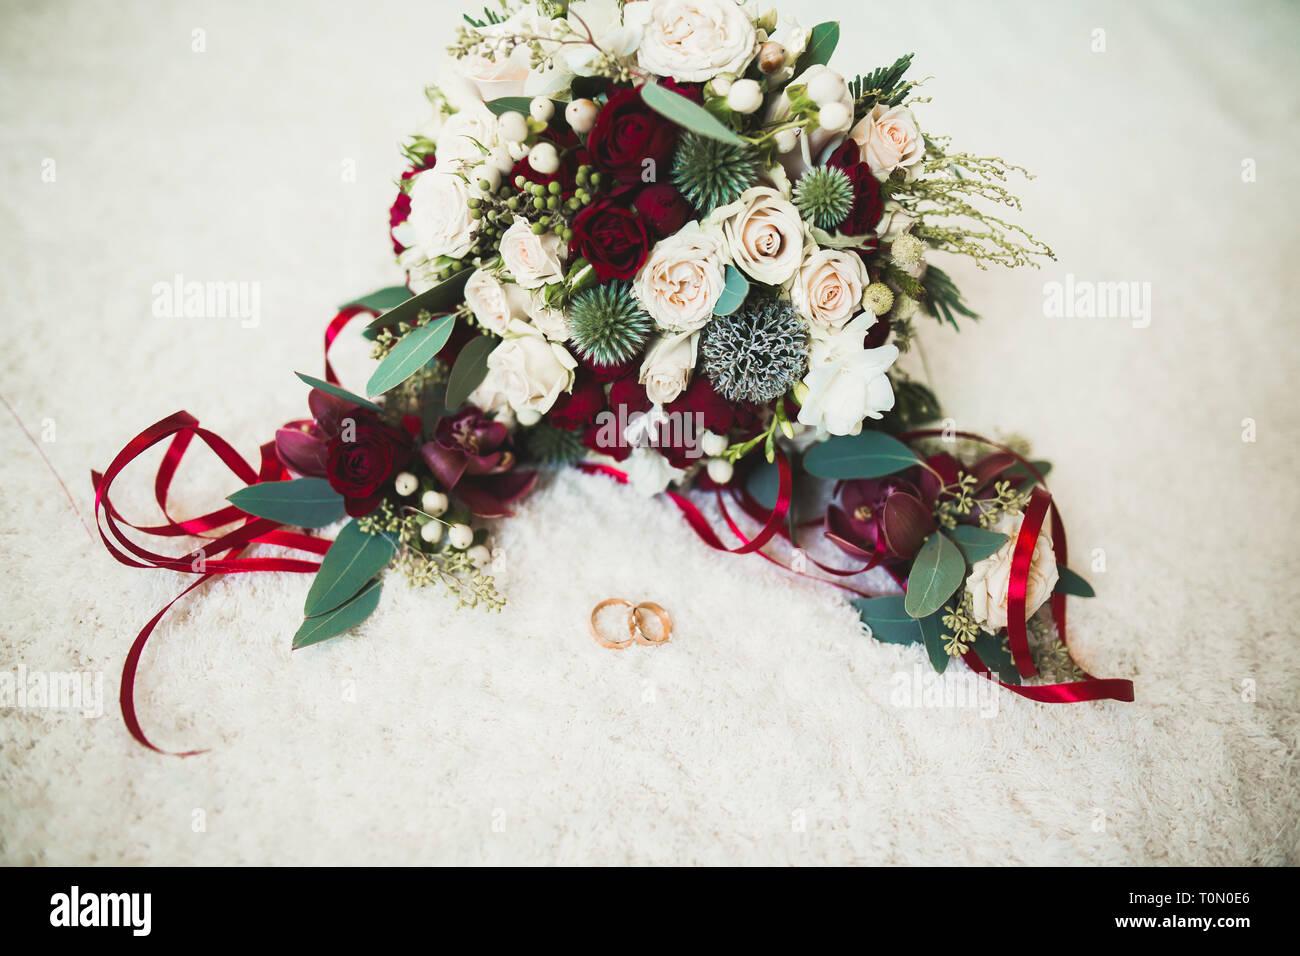 Close-up of wedding rings on beautiful background. - Stock Image